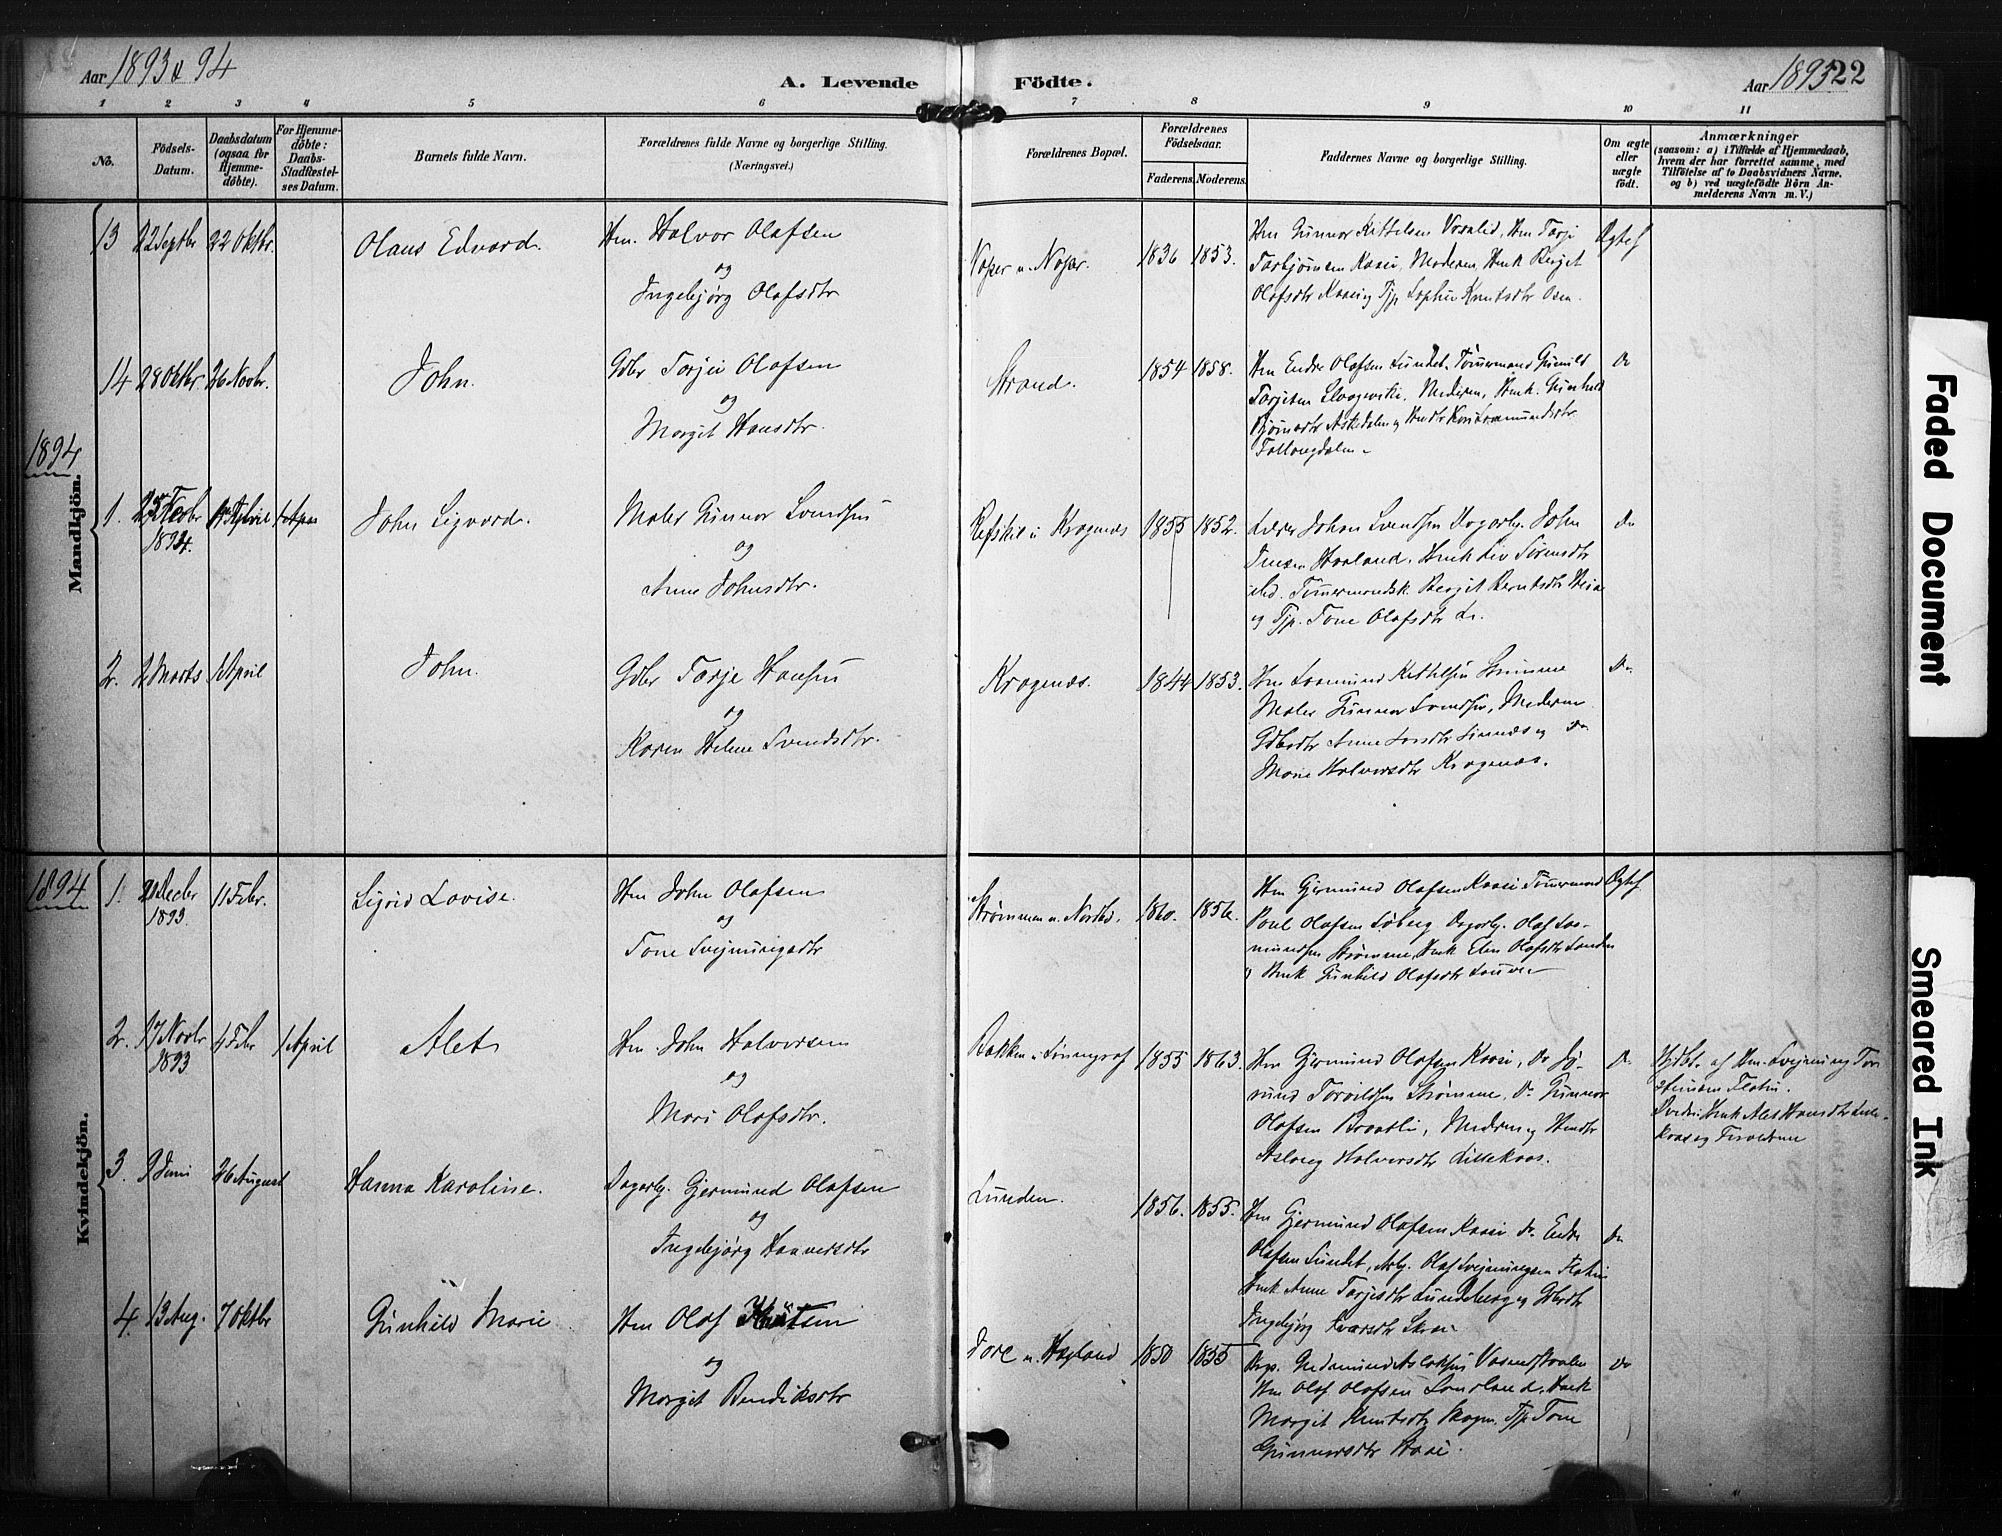 SAKO, Kviteseid kirkebøker, F/Fc/L0002: Ministerialbok nr. III 2, 1882-1908, s. 22